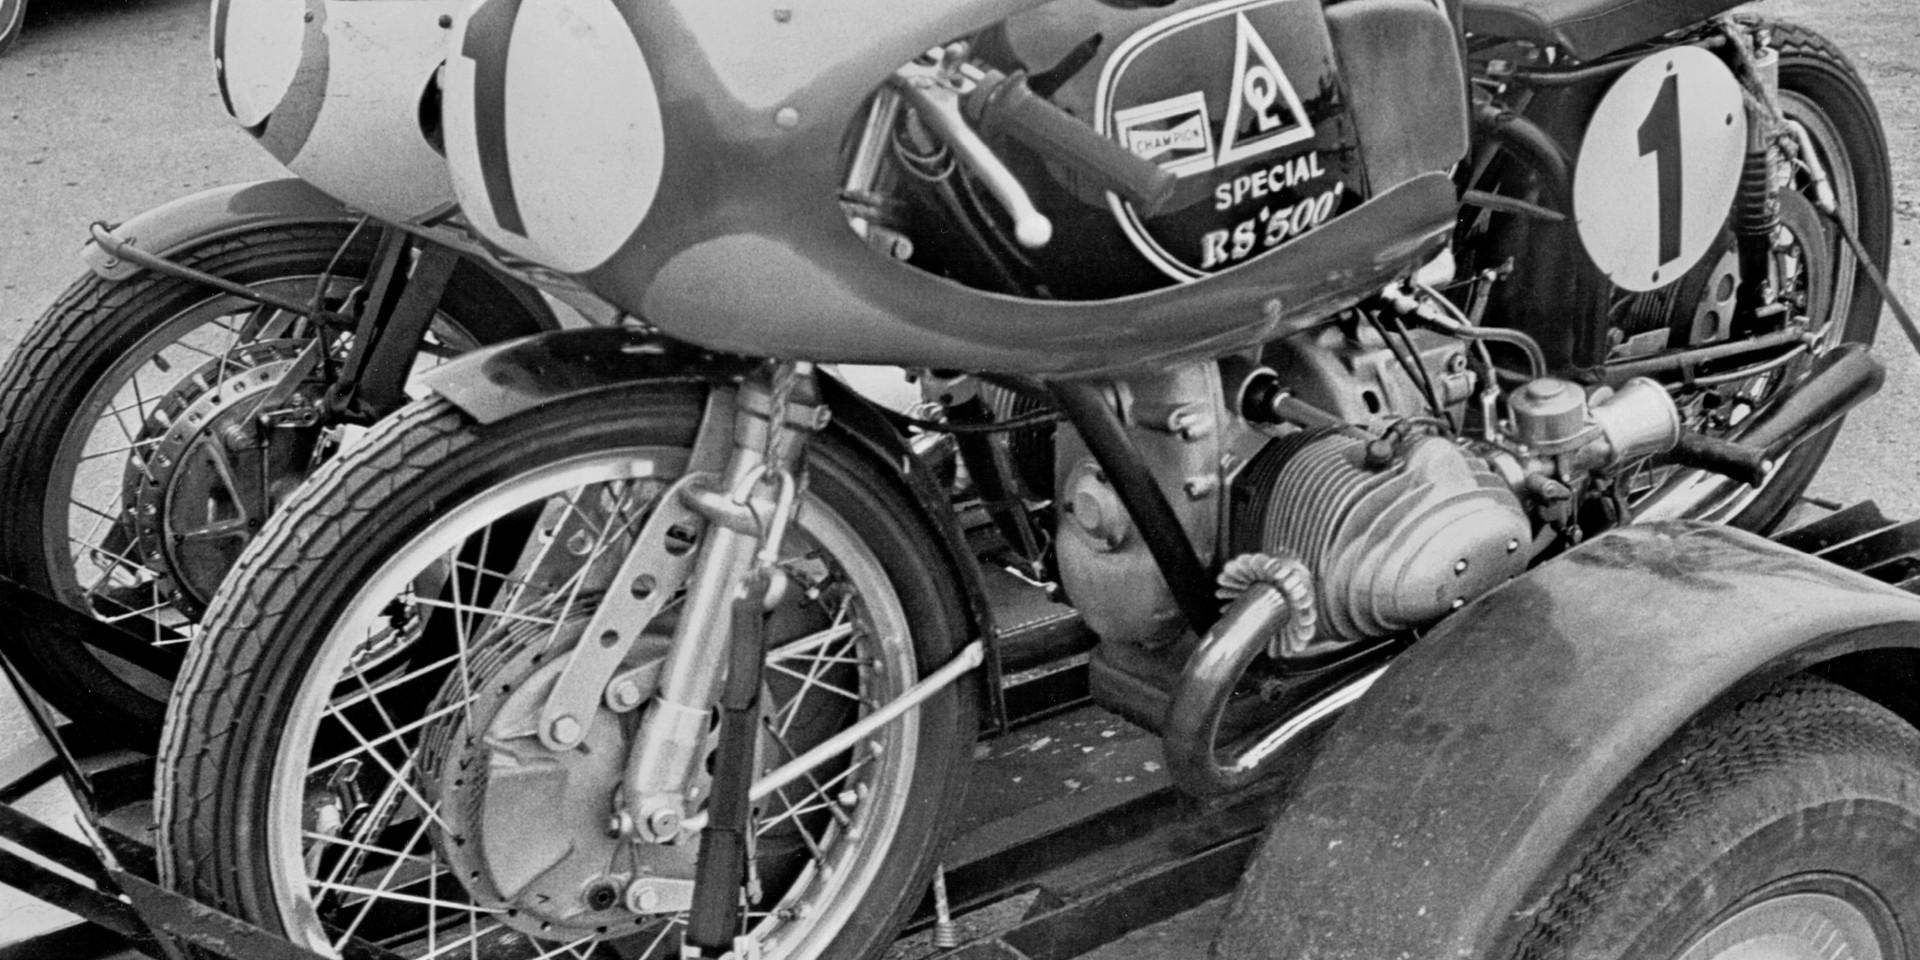 Mosport 1969 (#1 Plate)